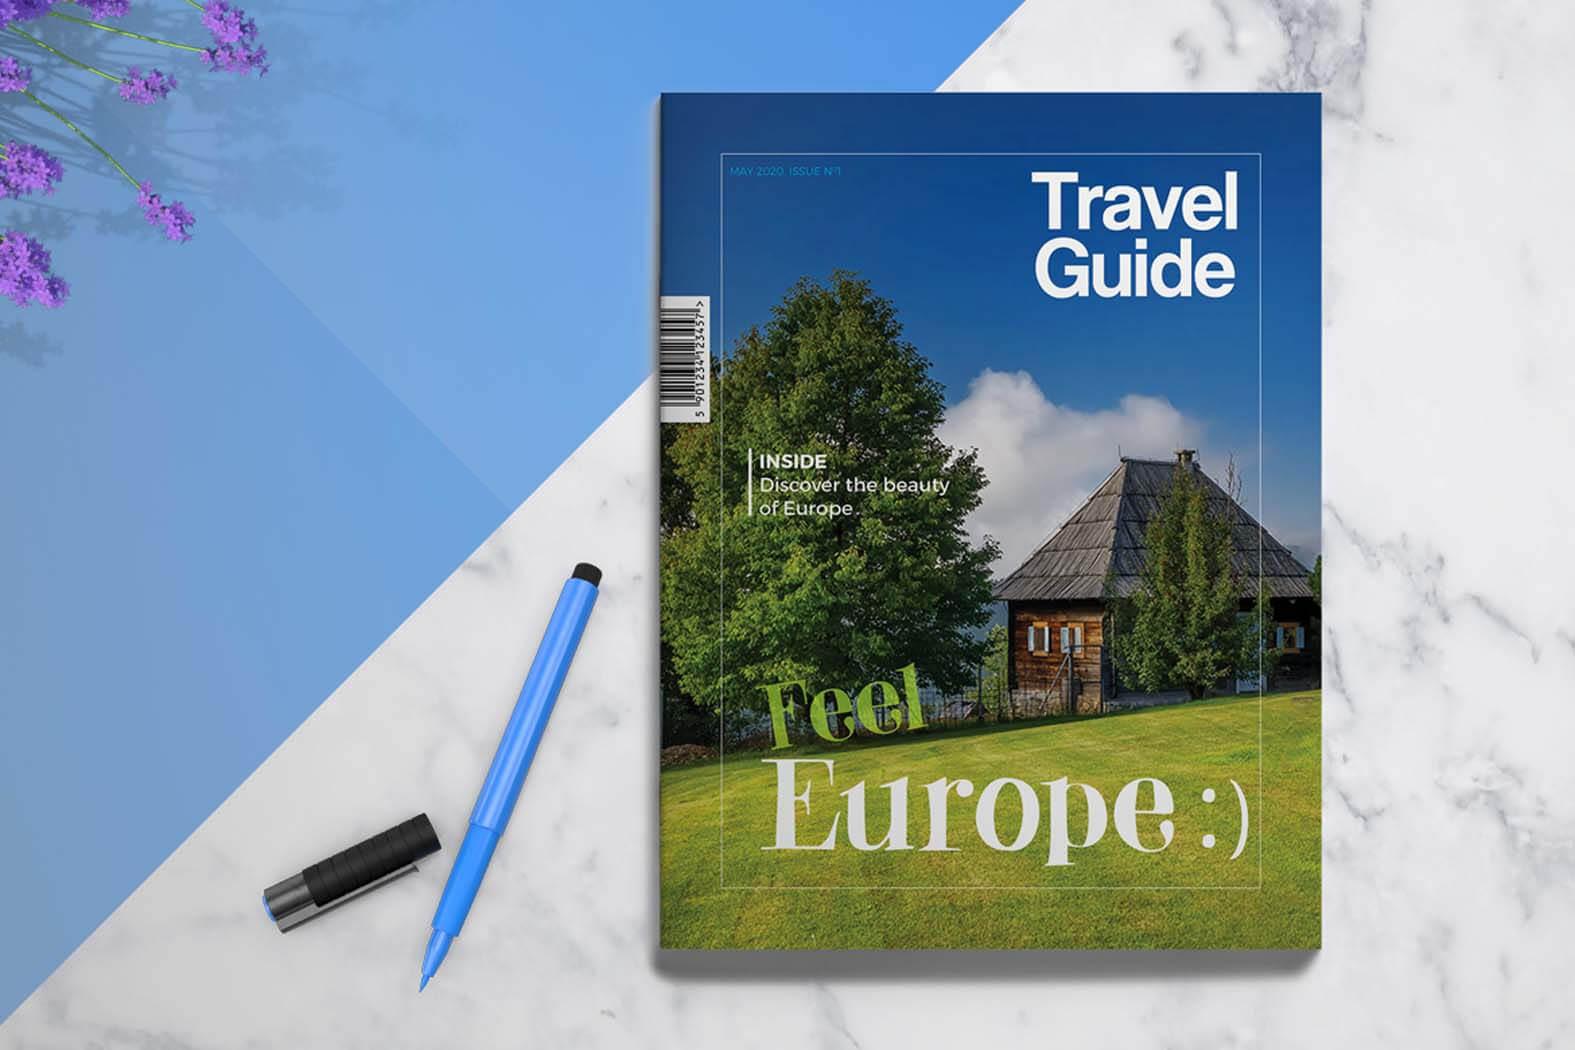 Insurance Brochure Template Travel Guide Brochure Template Within Travel Brochure Template Ks2